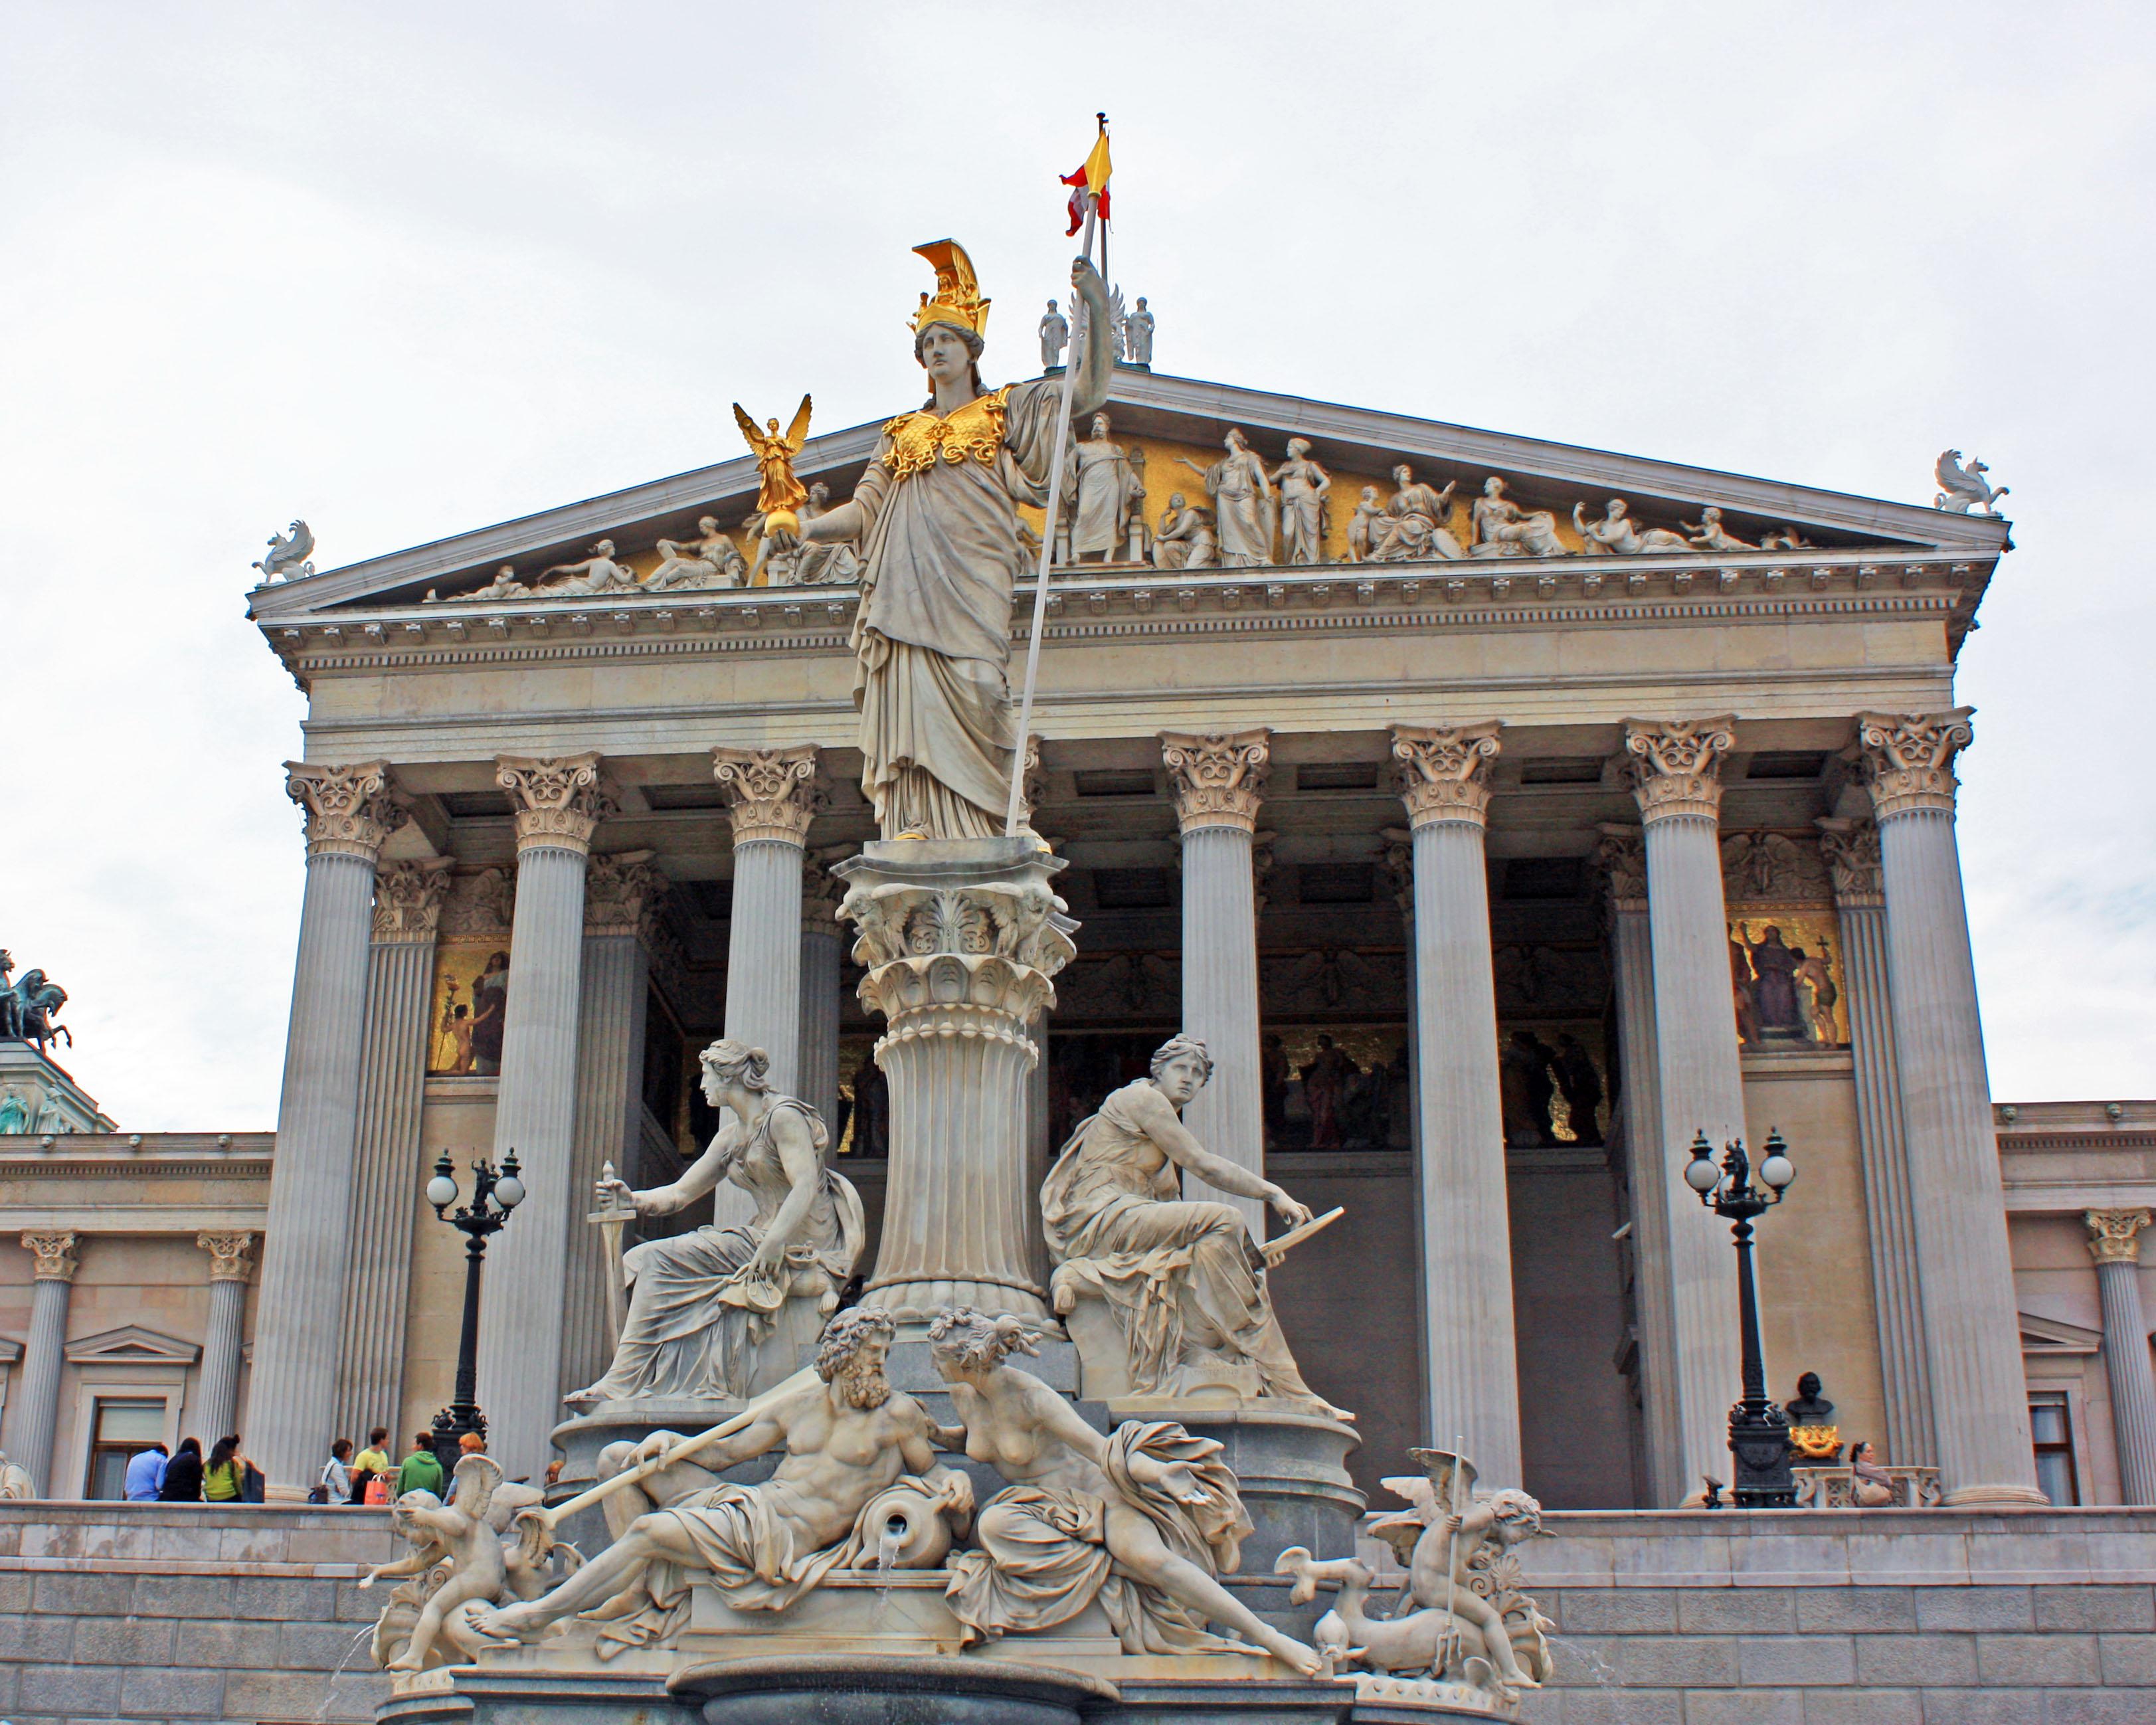 Austrian Parliament with a statue of Athena, the goddess of wisdom.